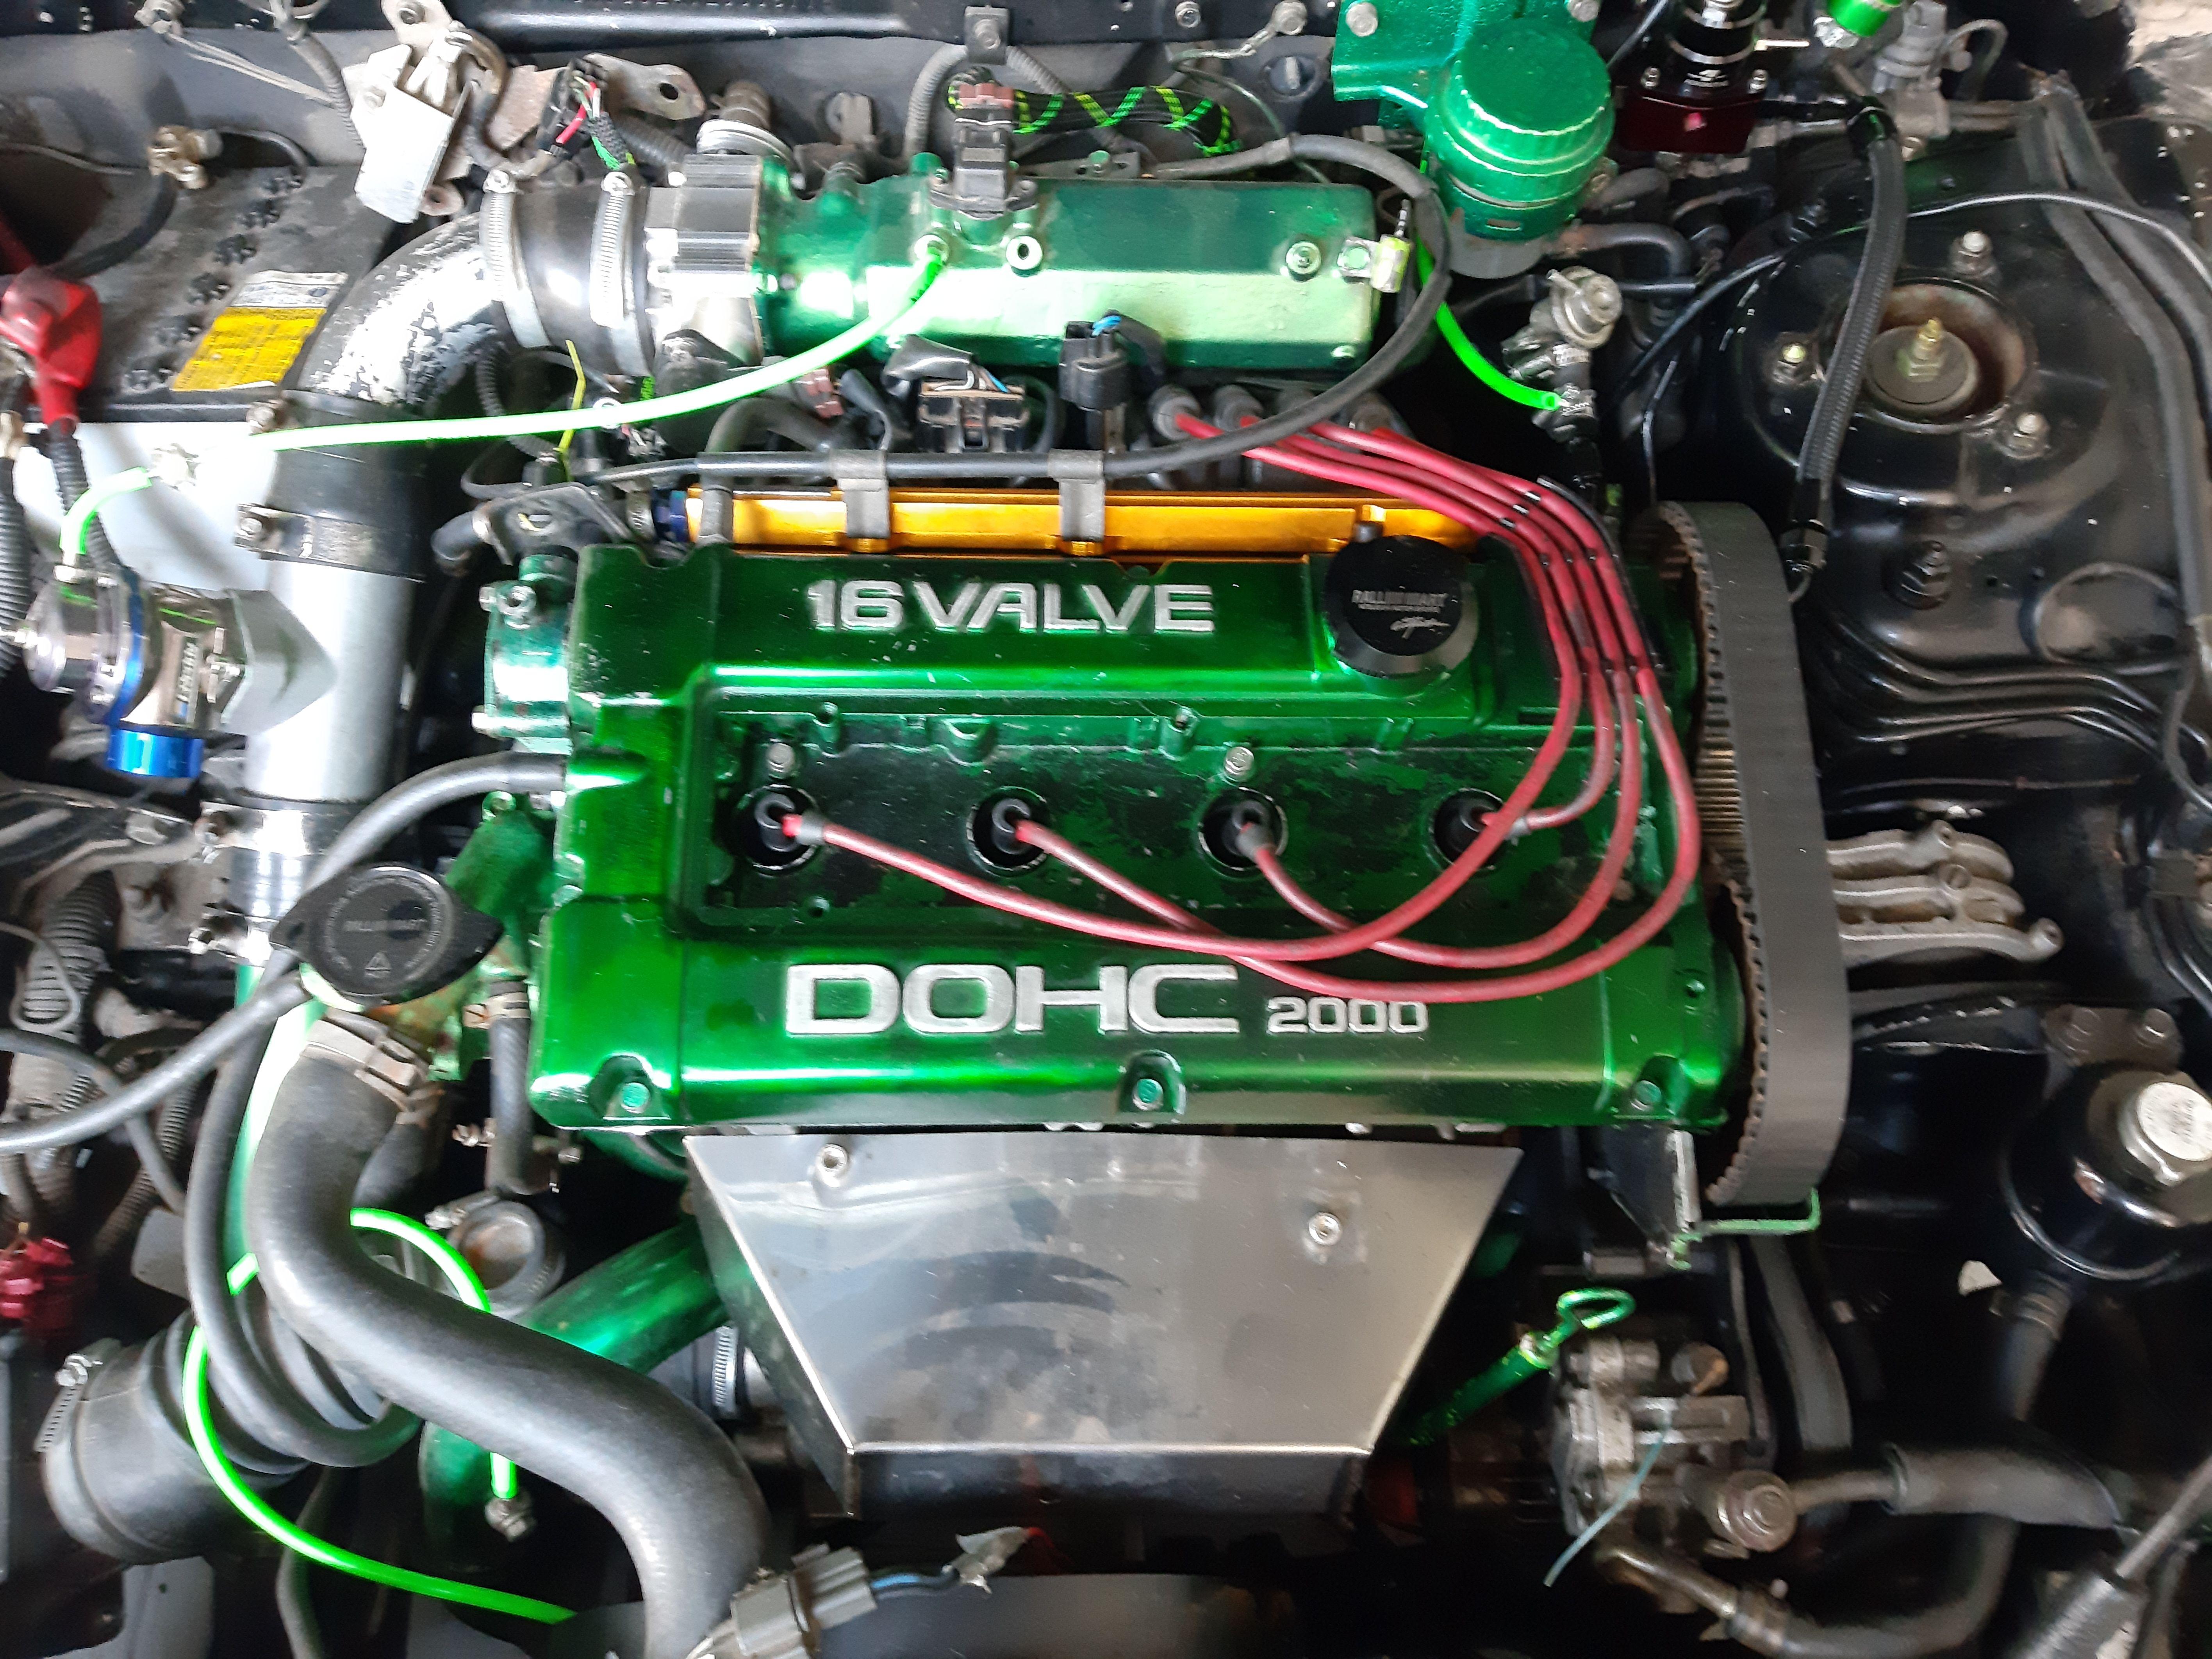 Modificaciones: Servicios de DG Motors Pedreguer